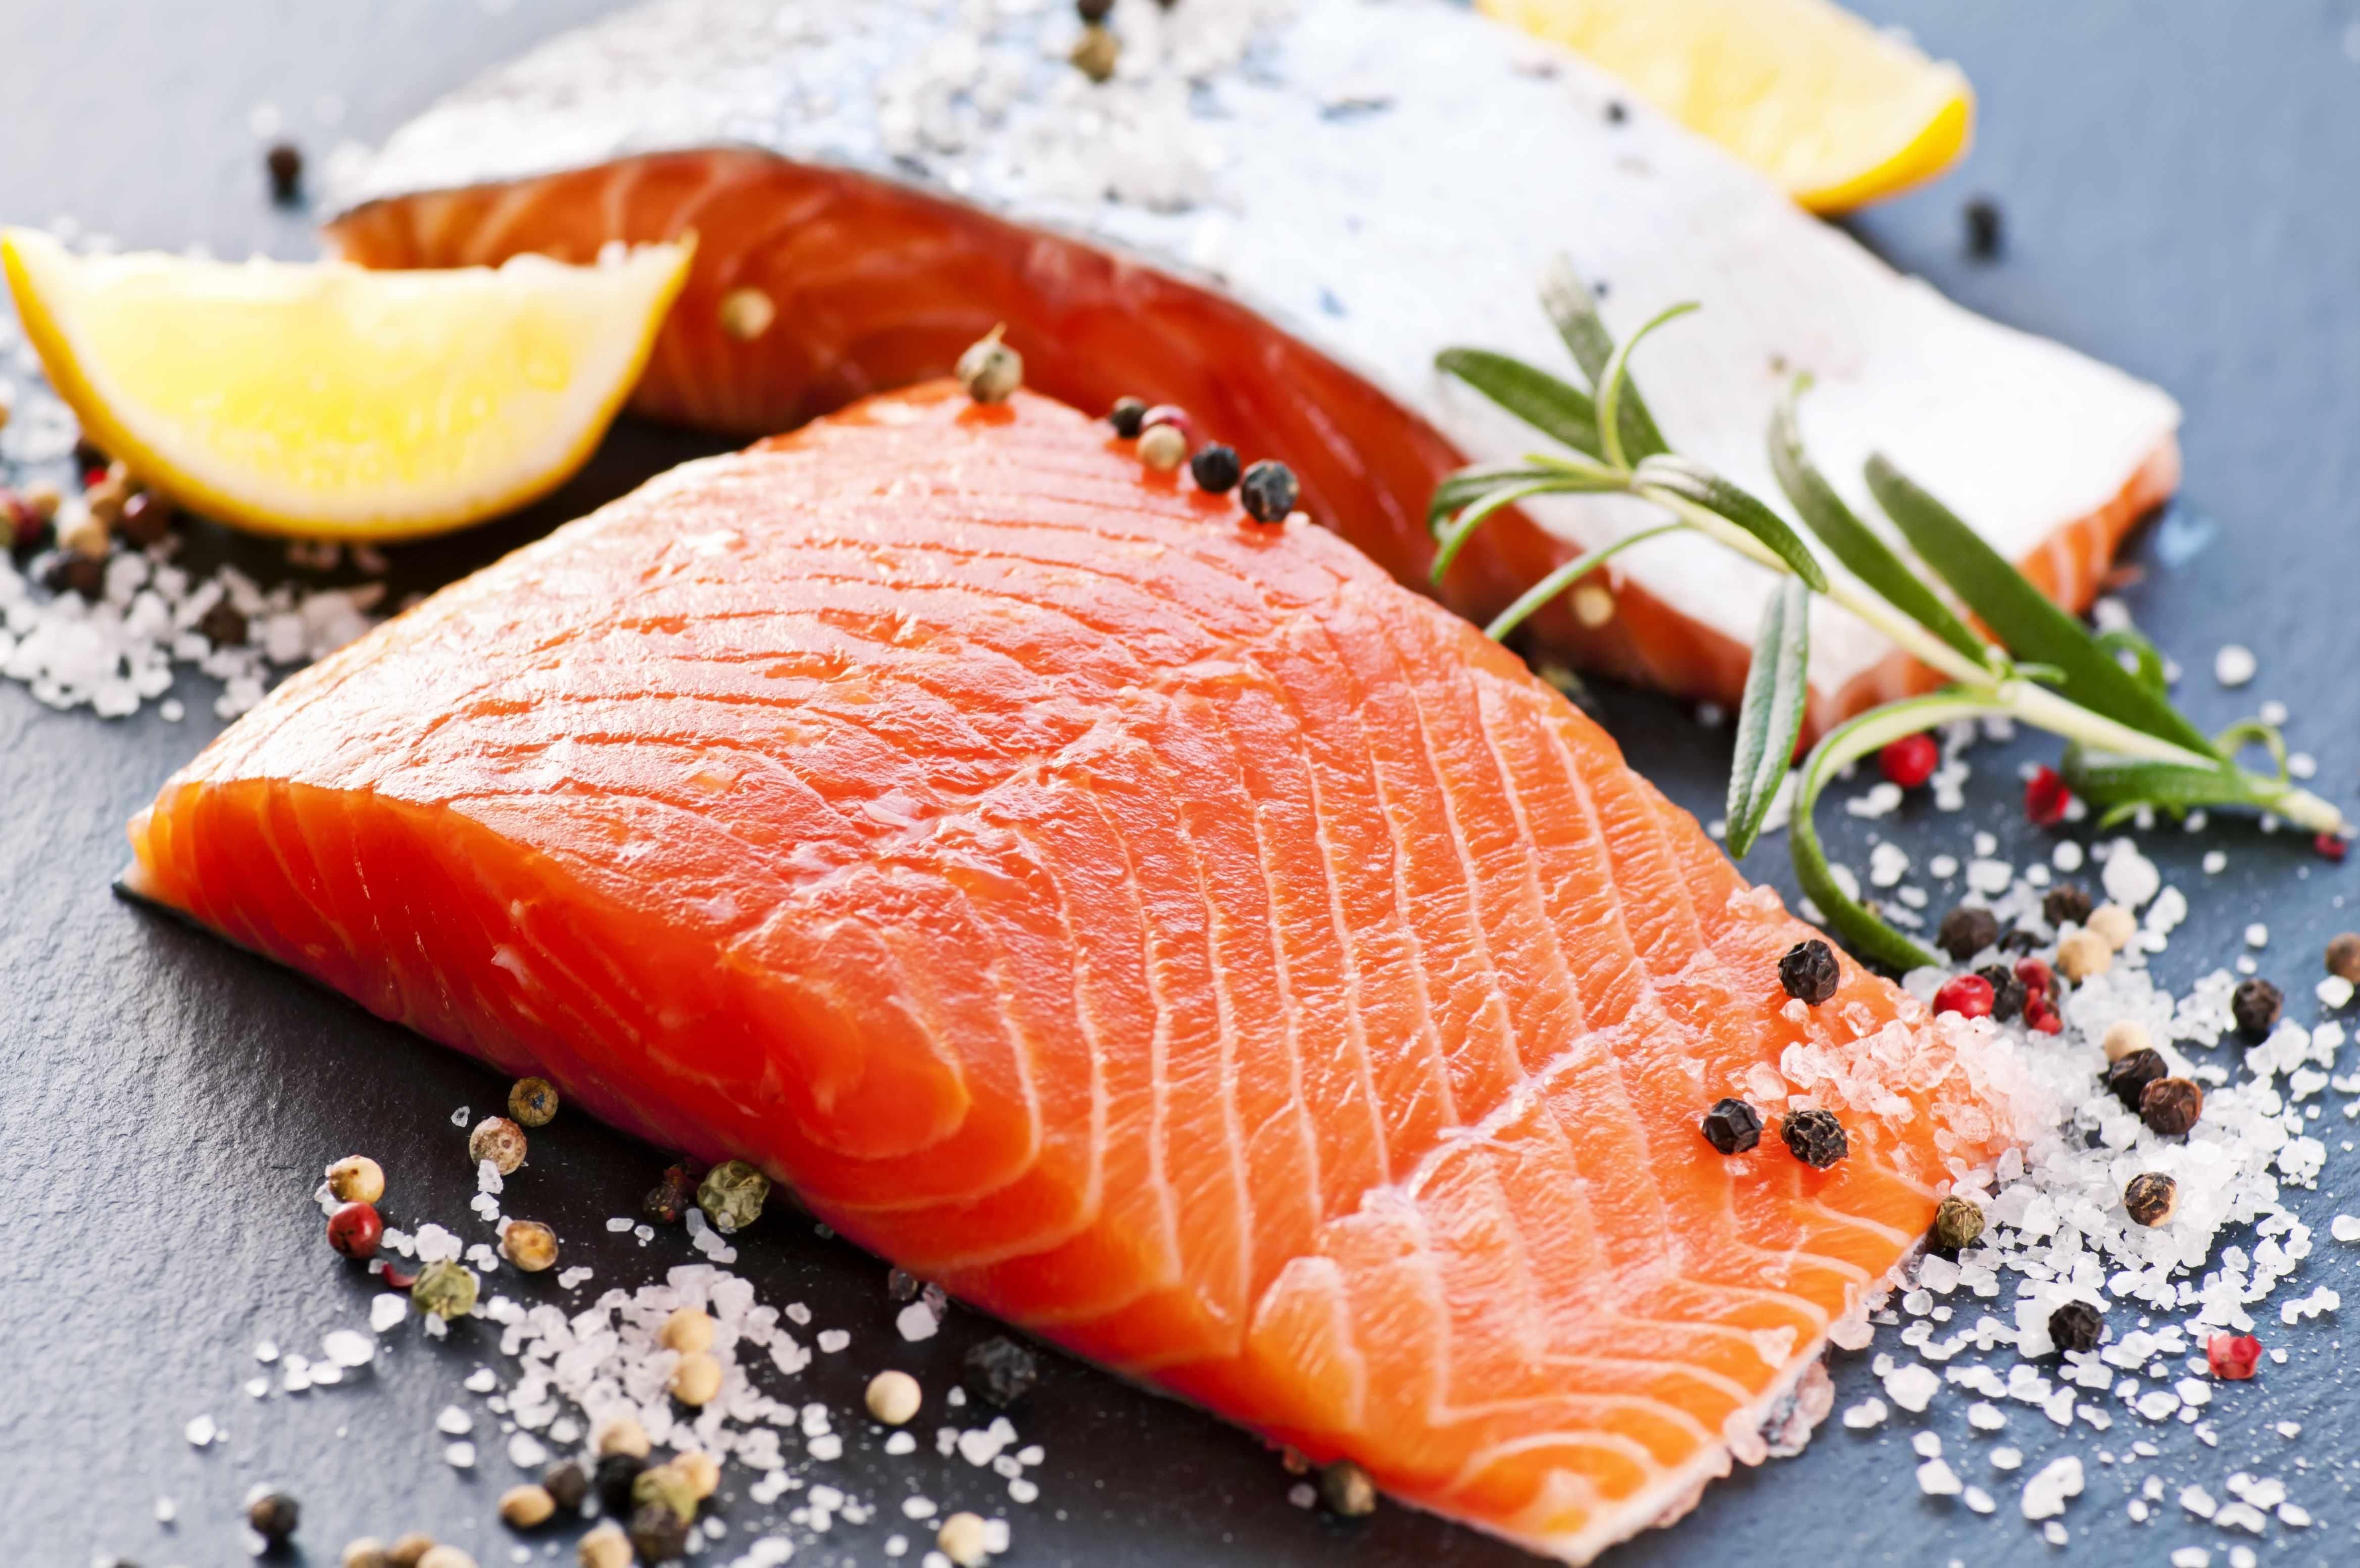 a fresh slice of salmon with lemon, sea salt and herbs